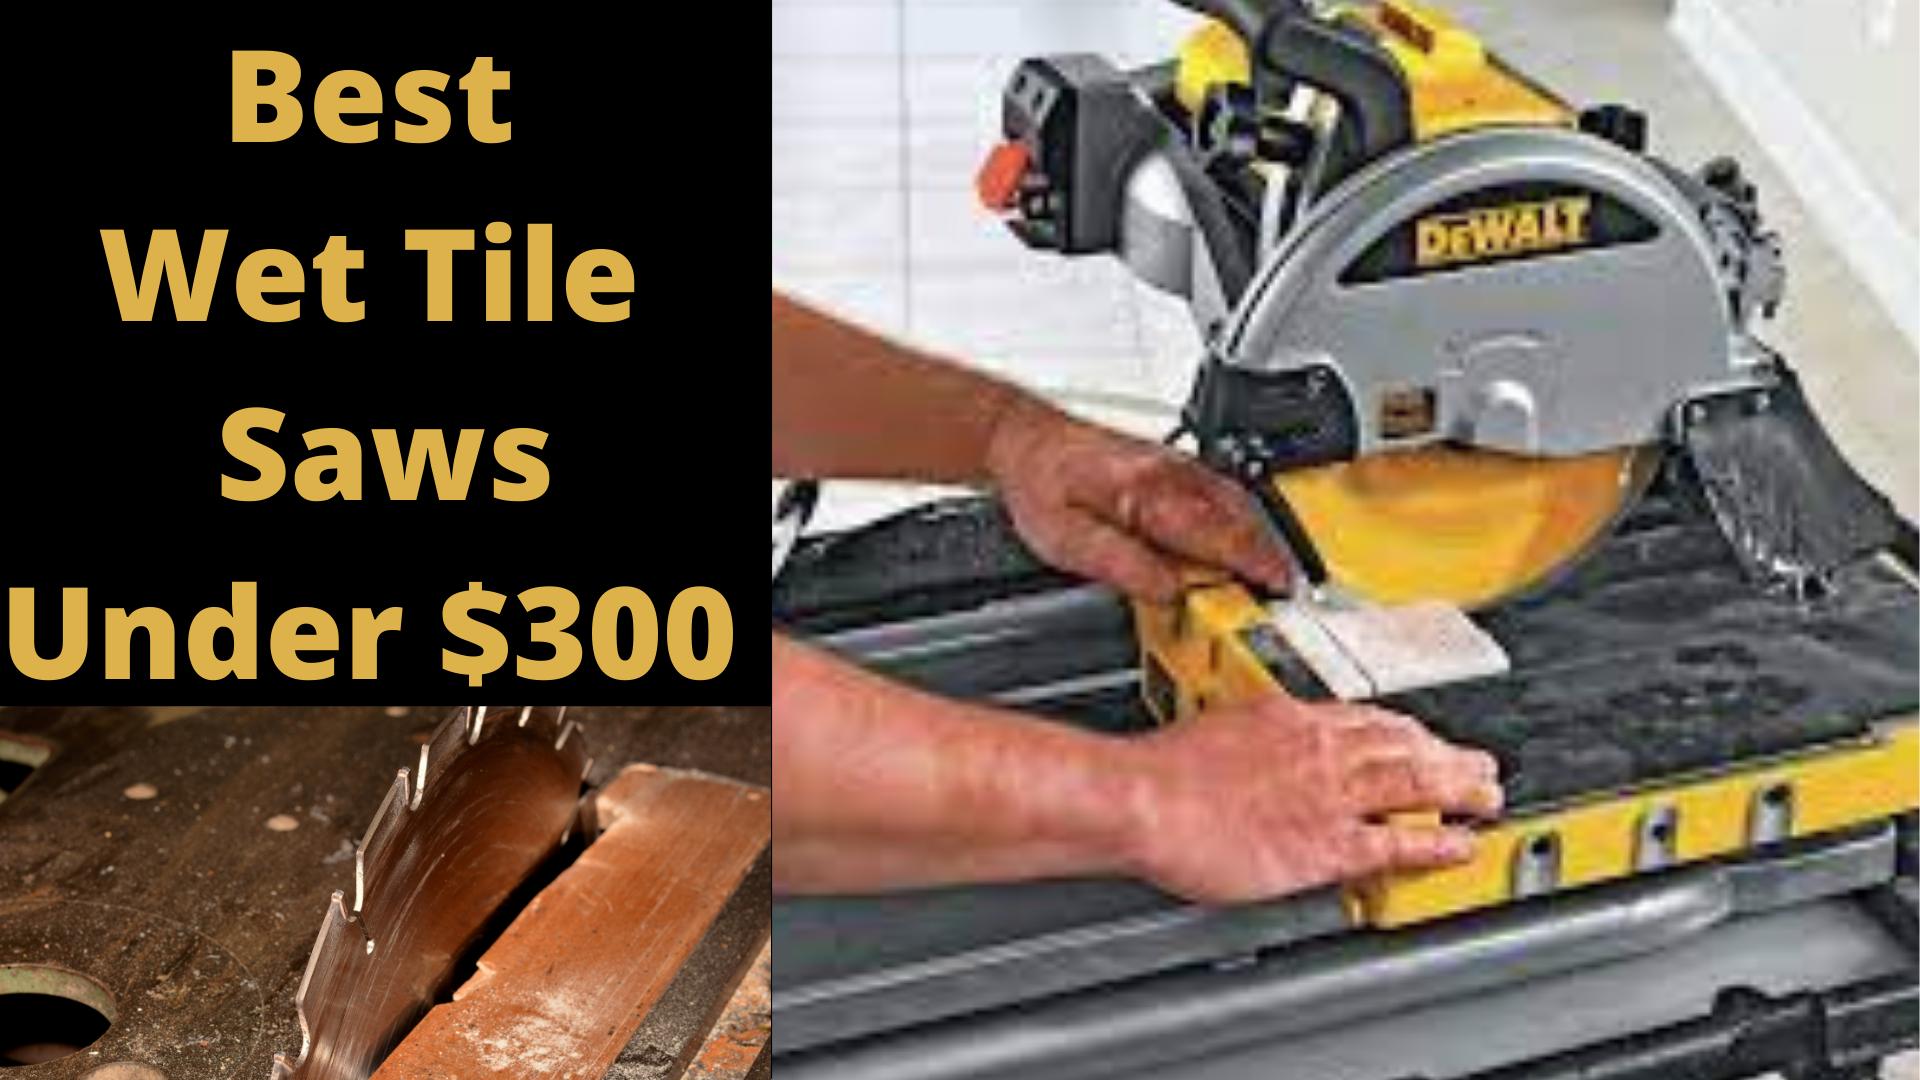 Best Wet Tile Saws Under $300